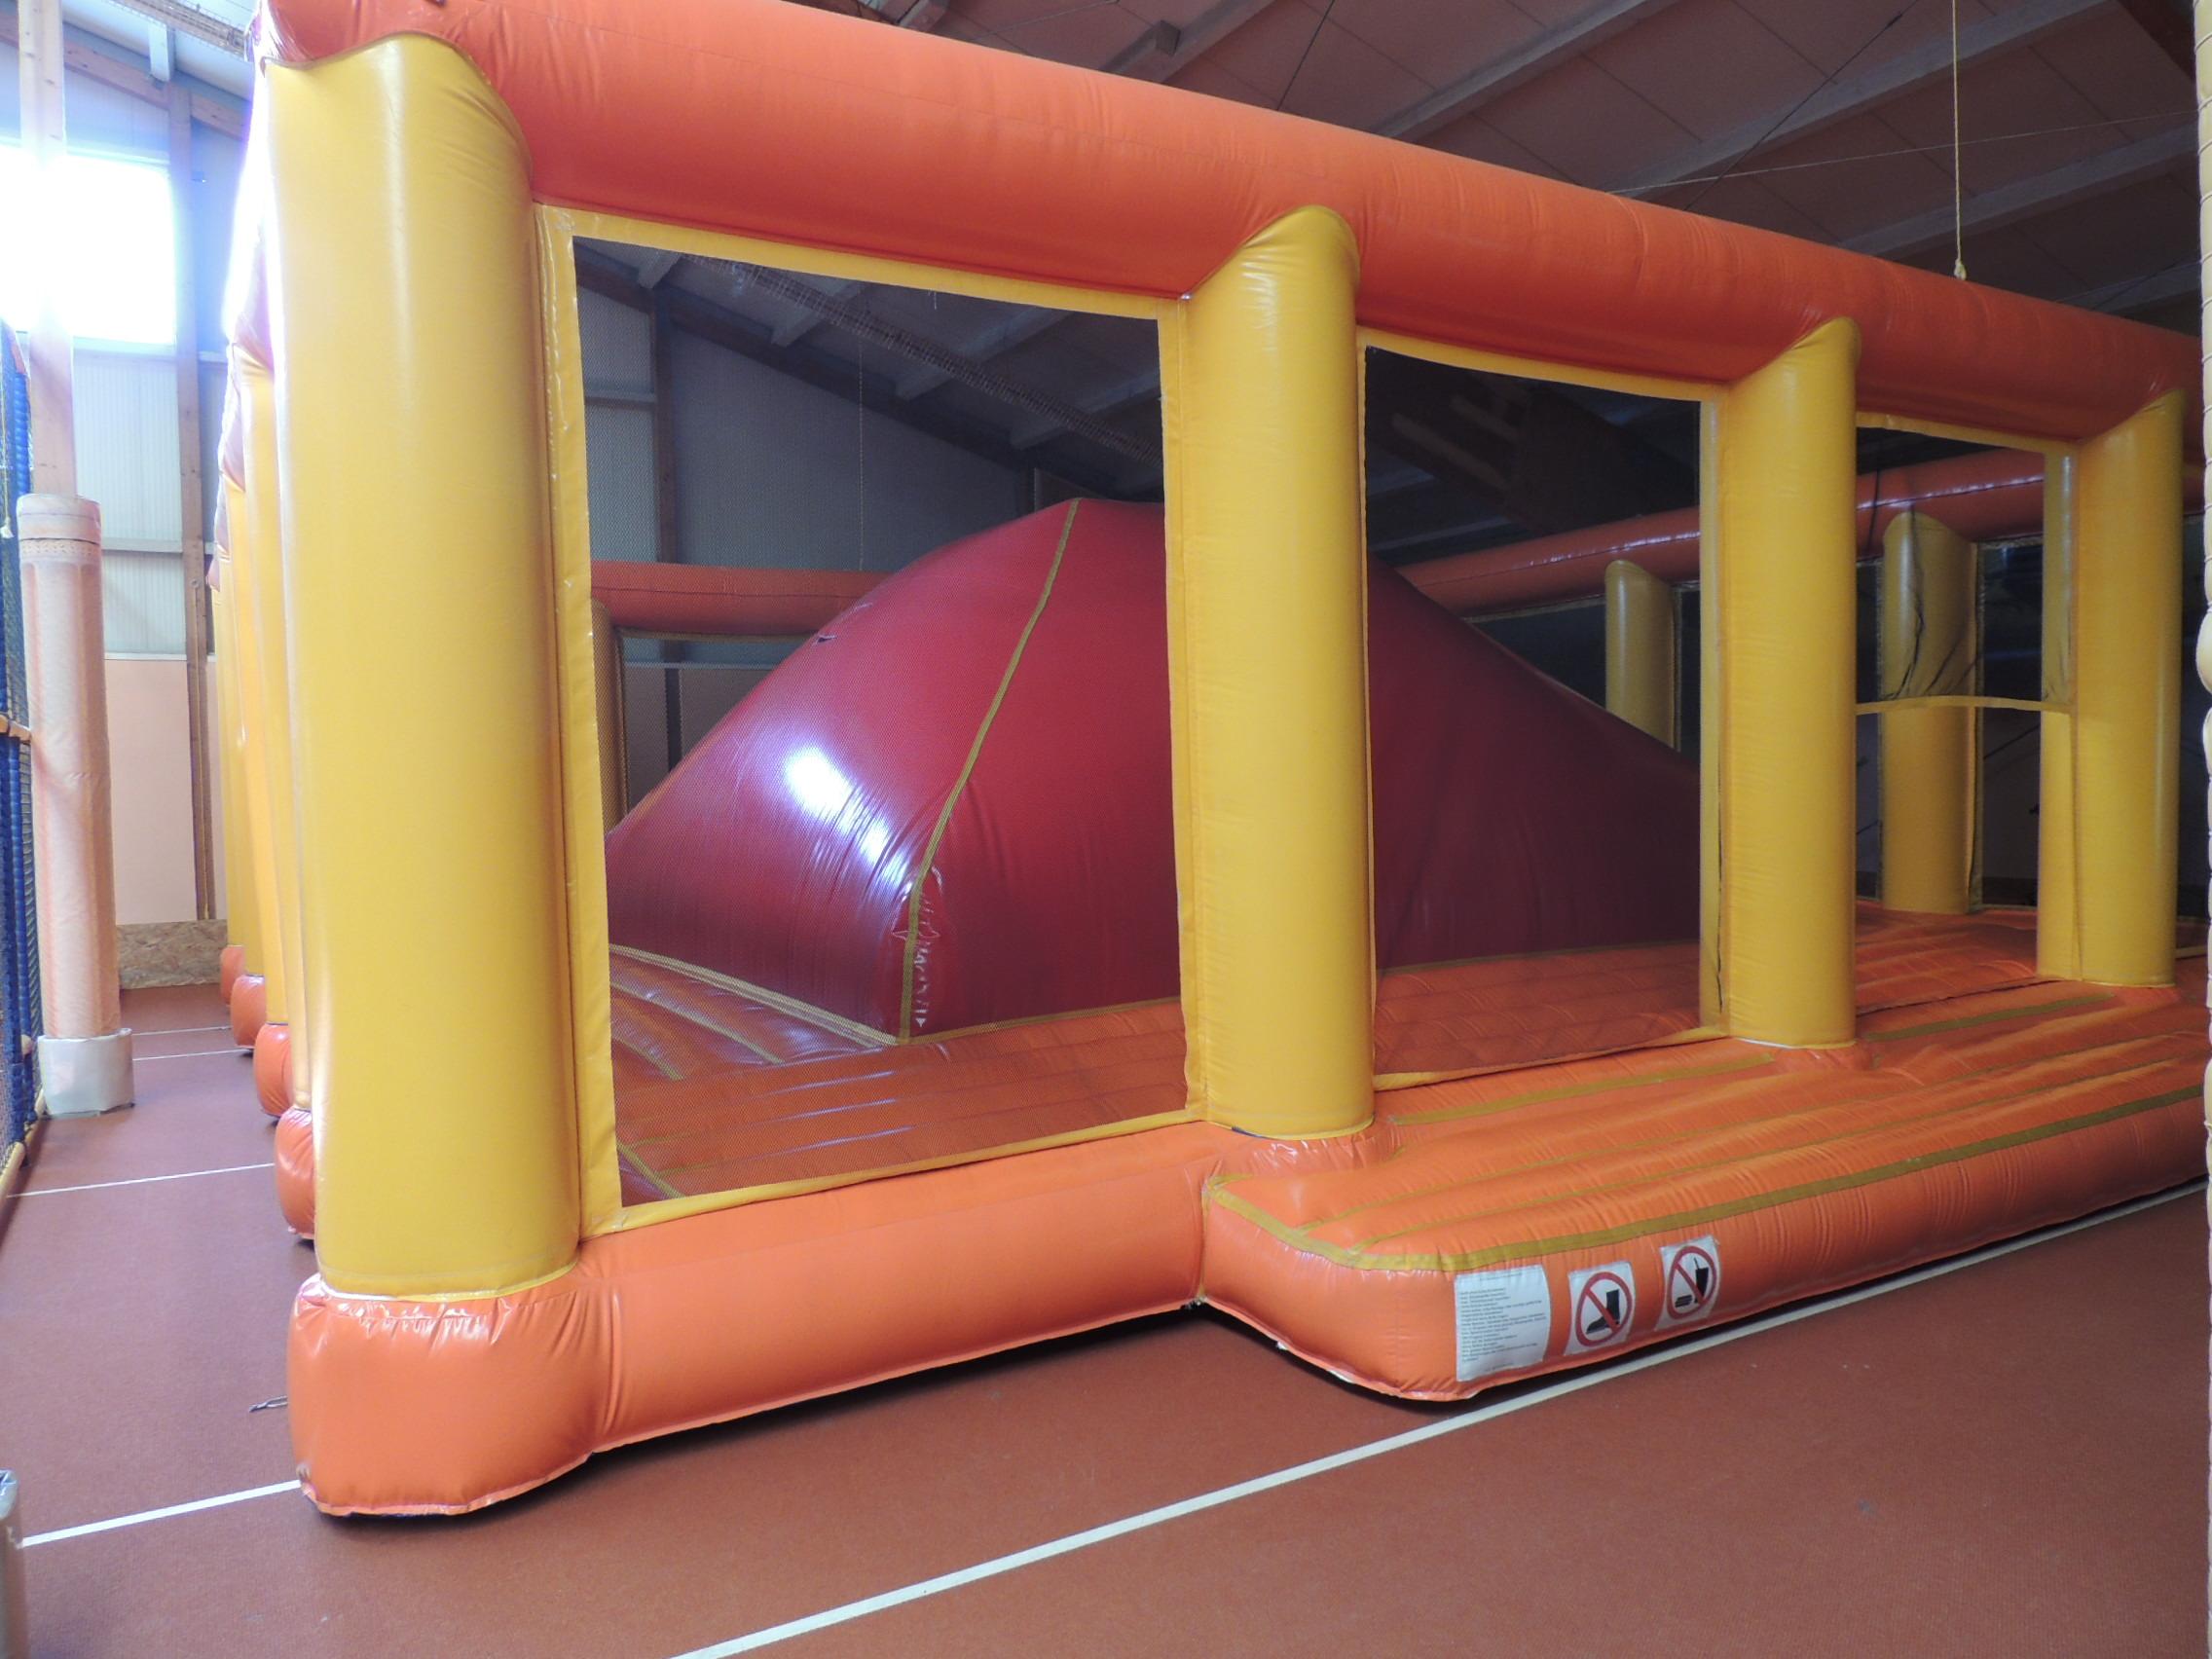 Fotos de MegaFun Kinderspieleparadies GmbH